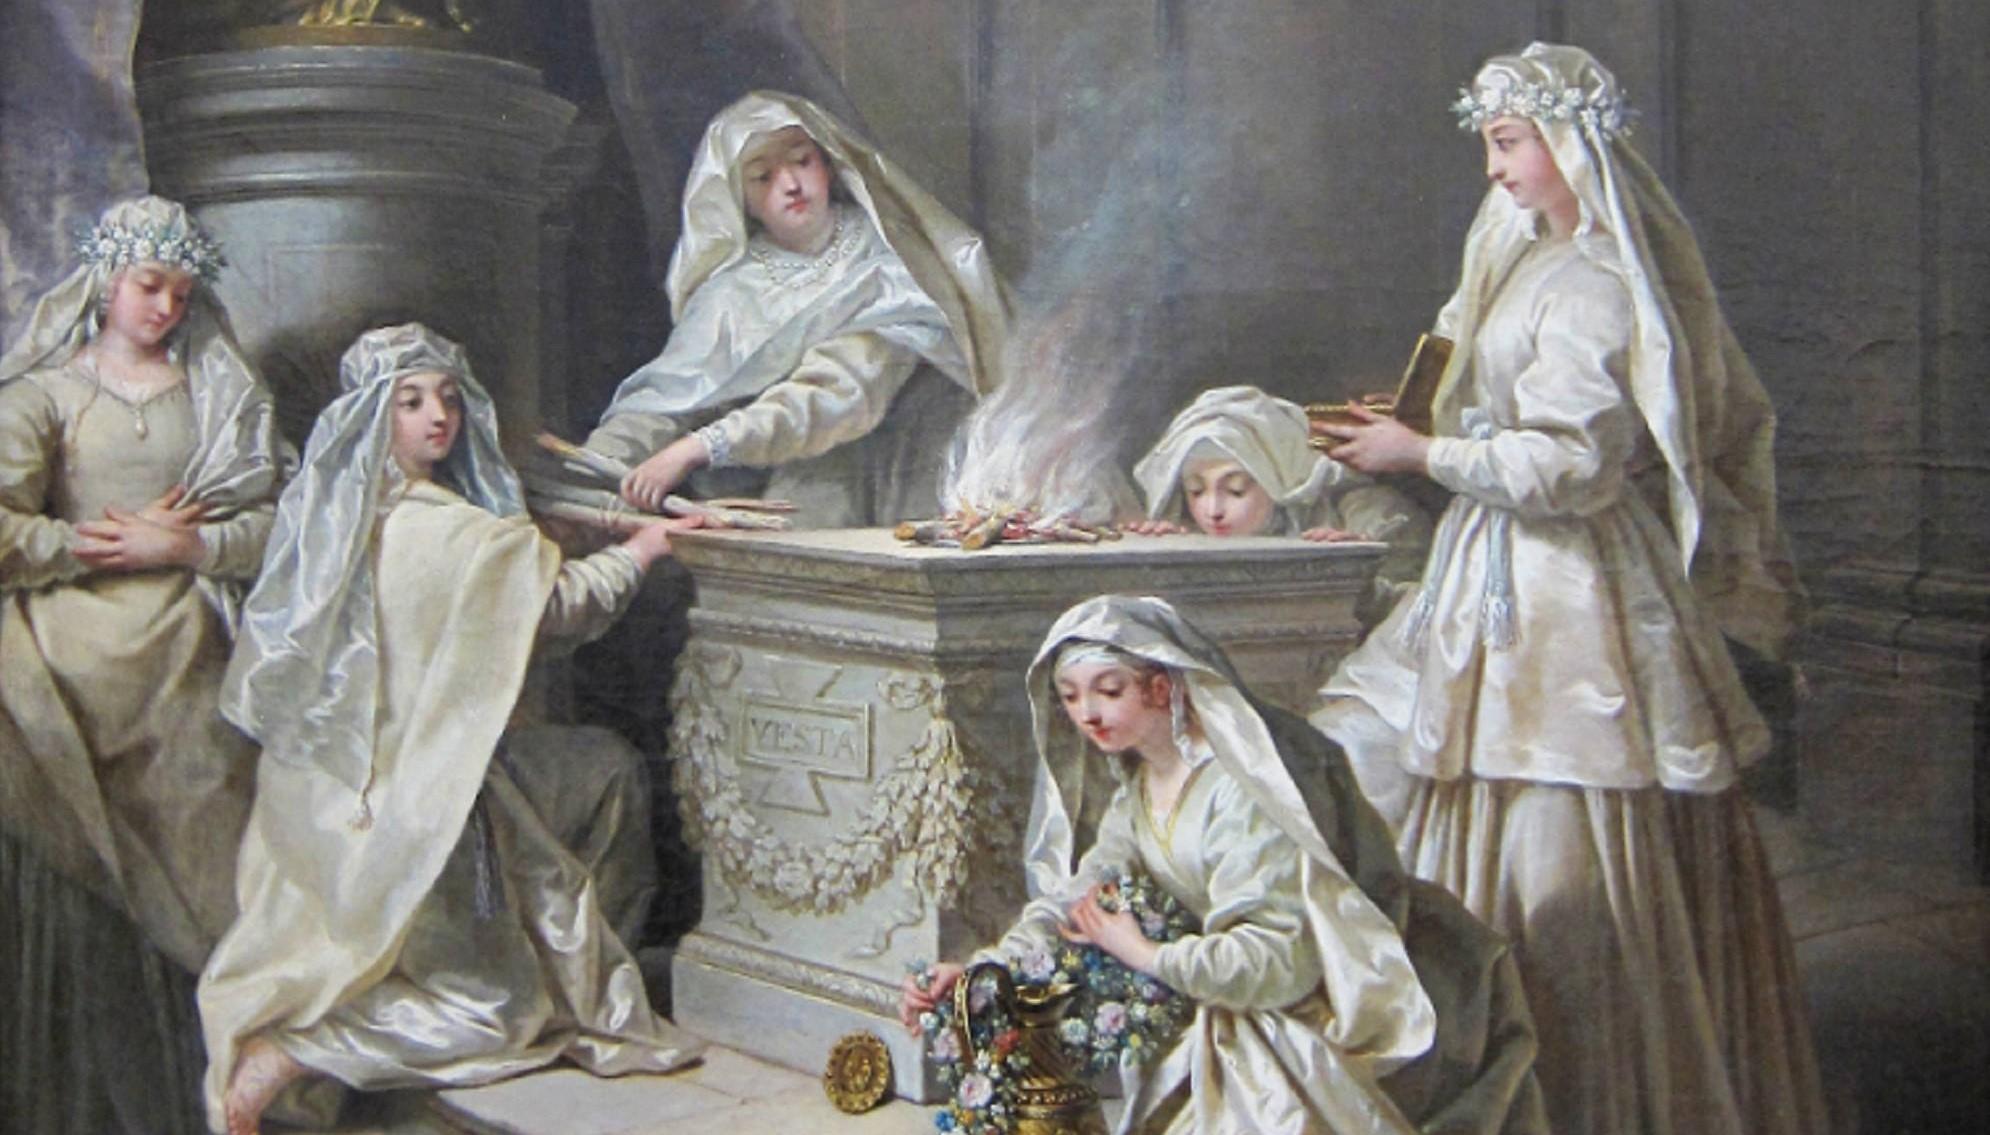 What were the Duties of the Vestal Virgins?